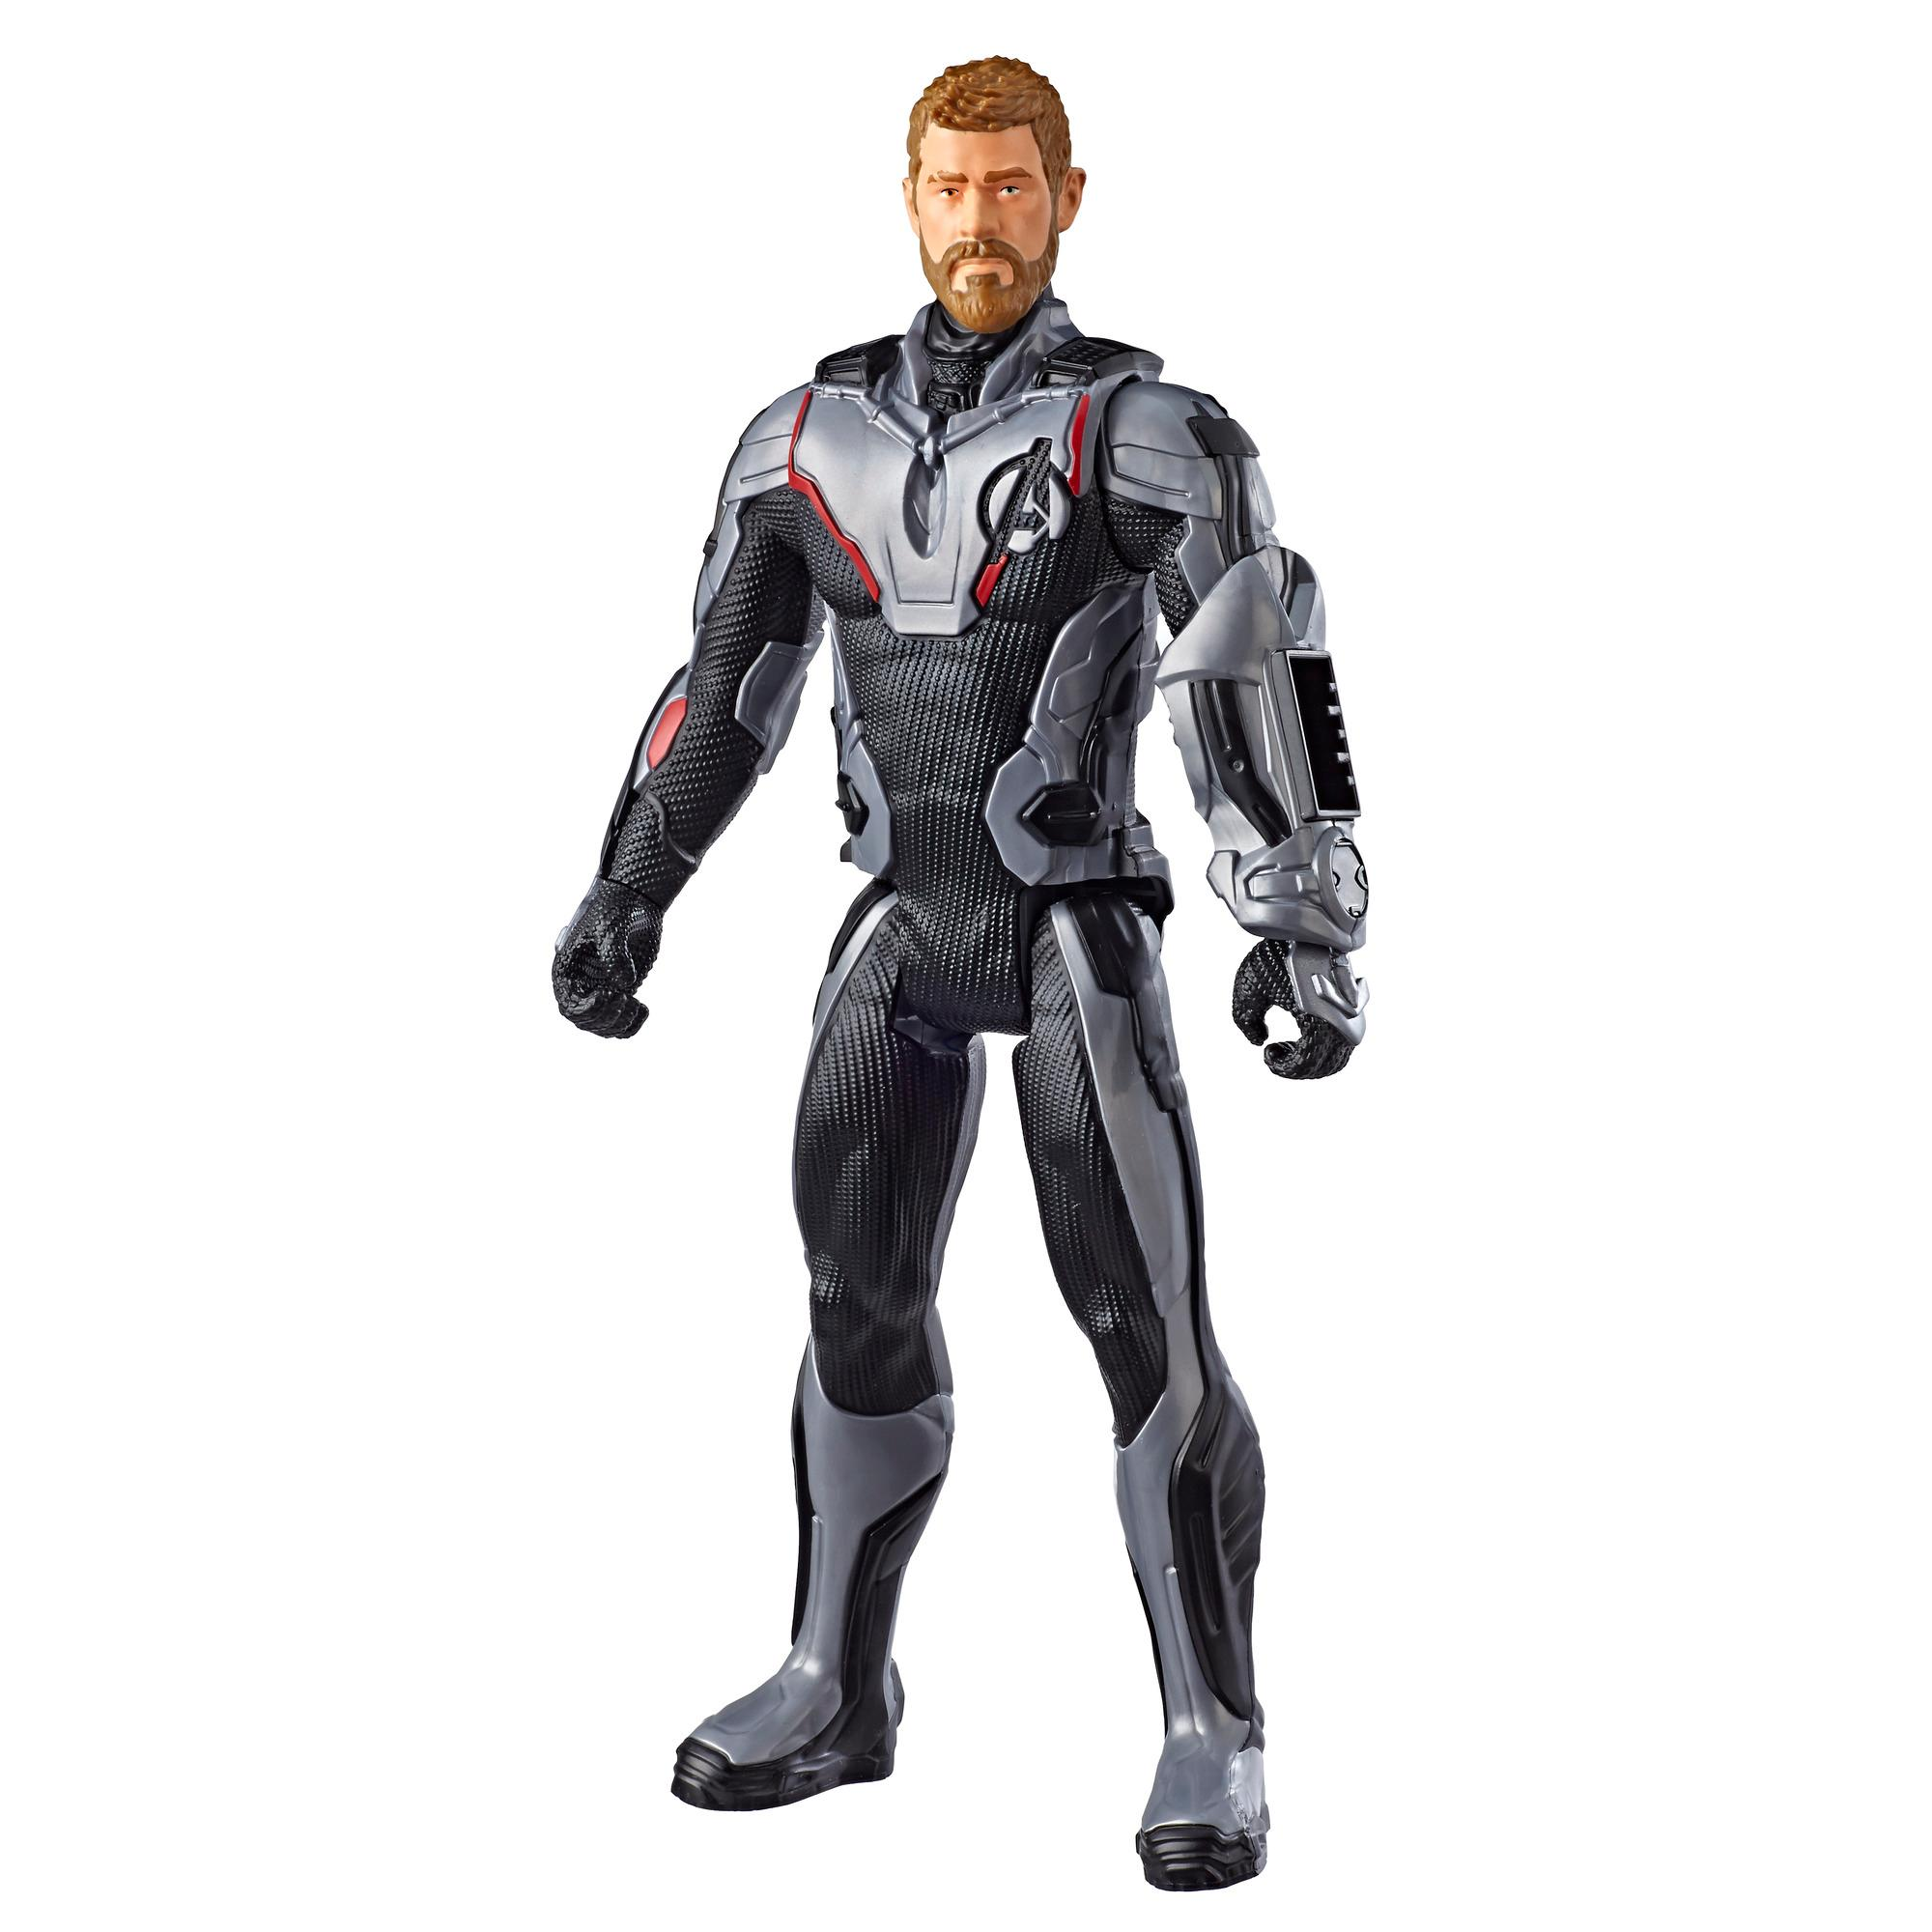 Avengers Endgame Titan Hero Thor